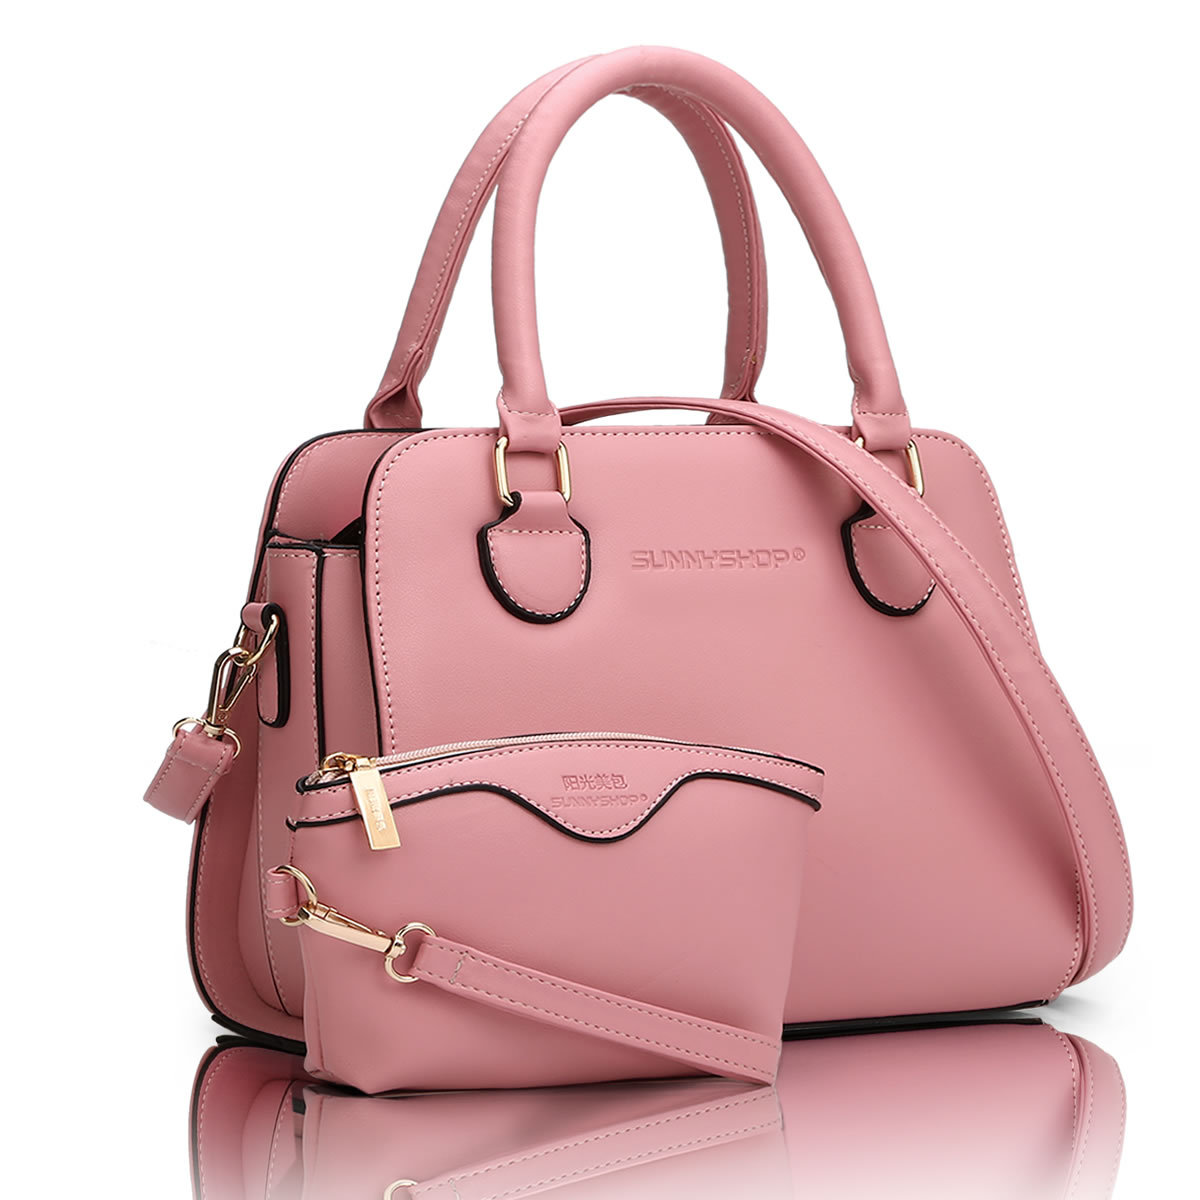 2 BAGS/SET NEW  European American fashion casual handbag  Socialite shoulder bag with small purse  fashion business women bag Q5